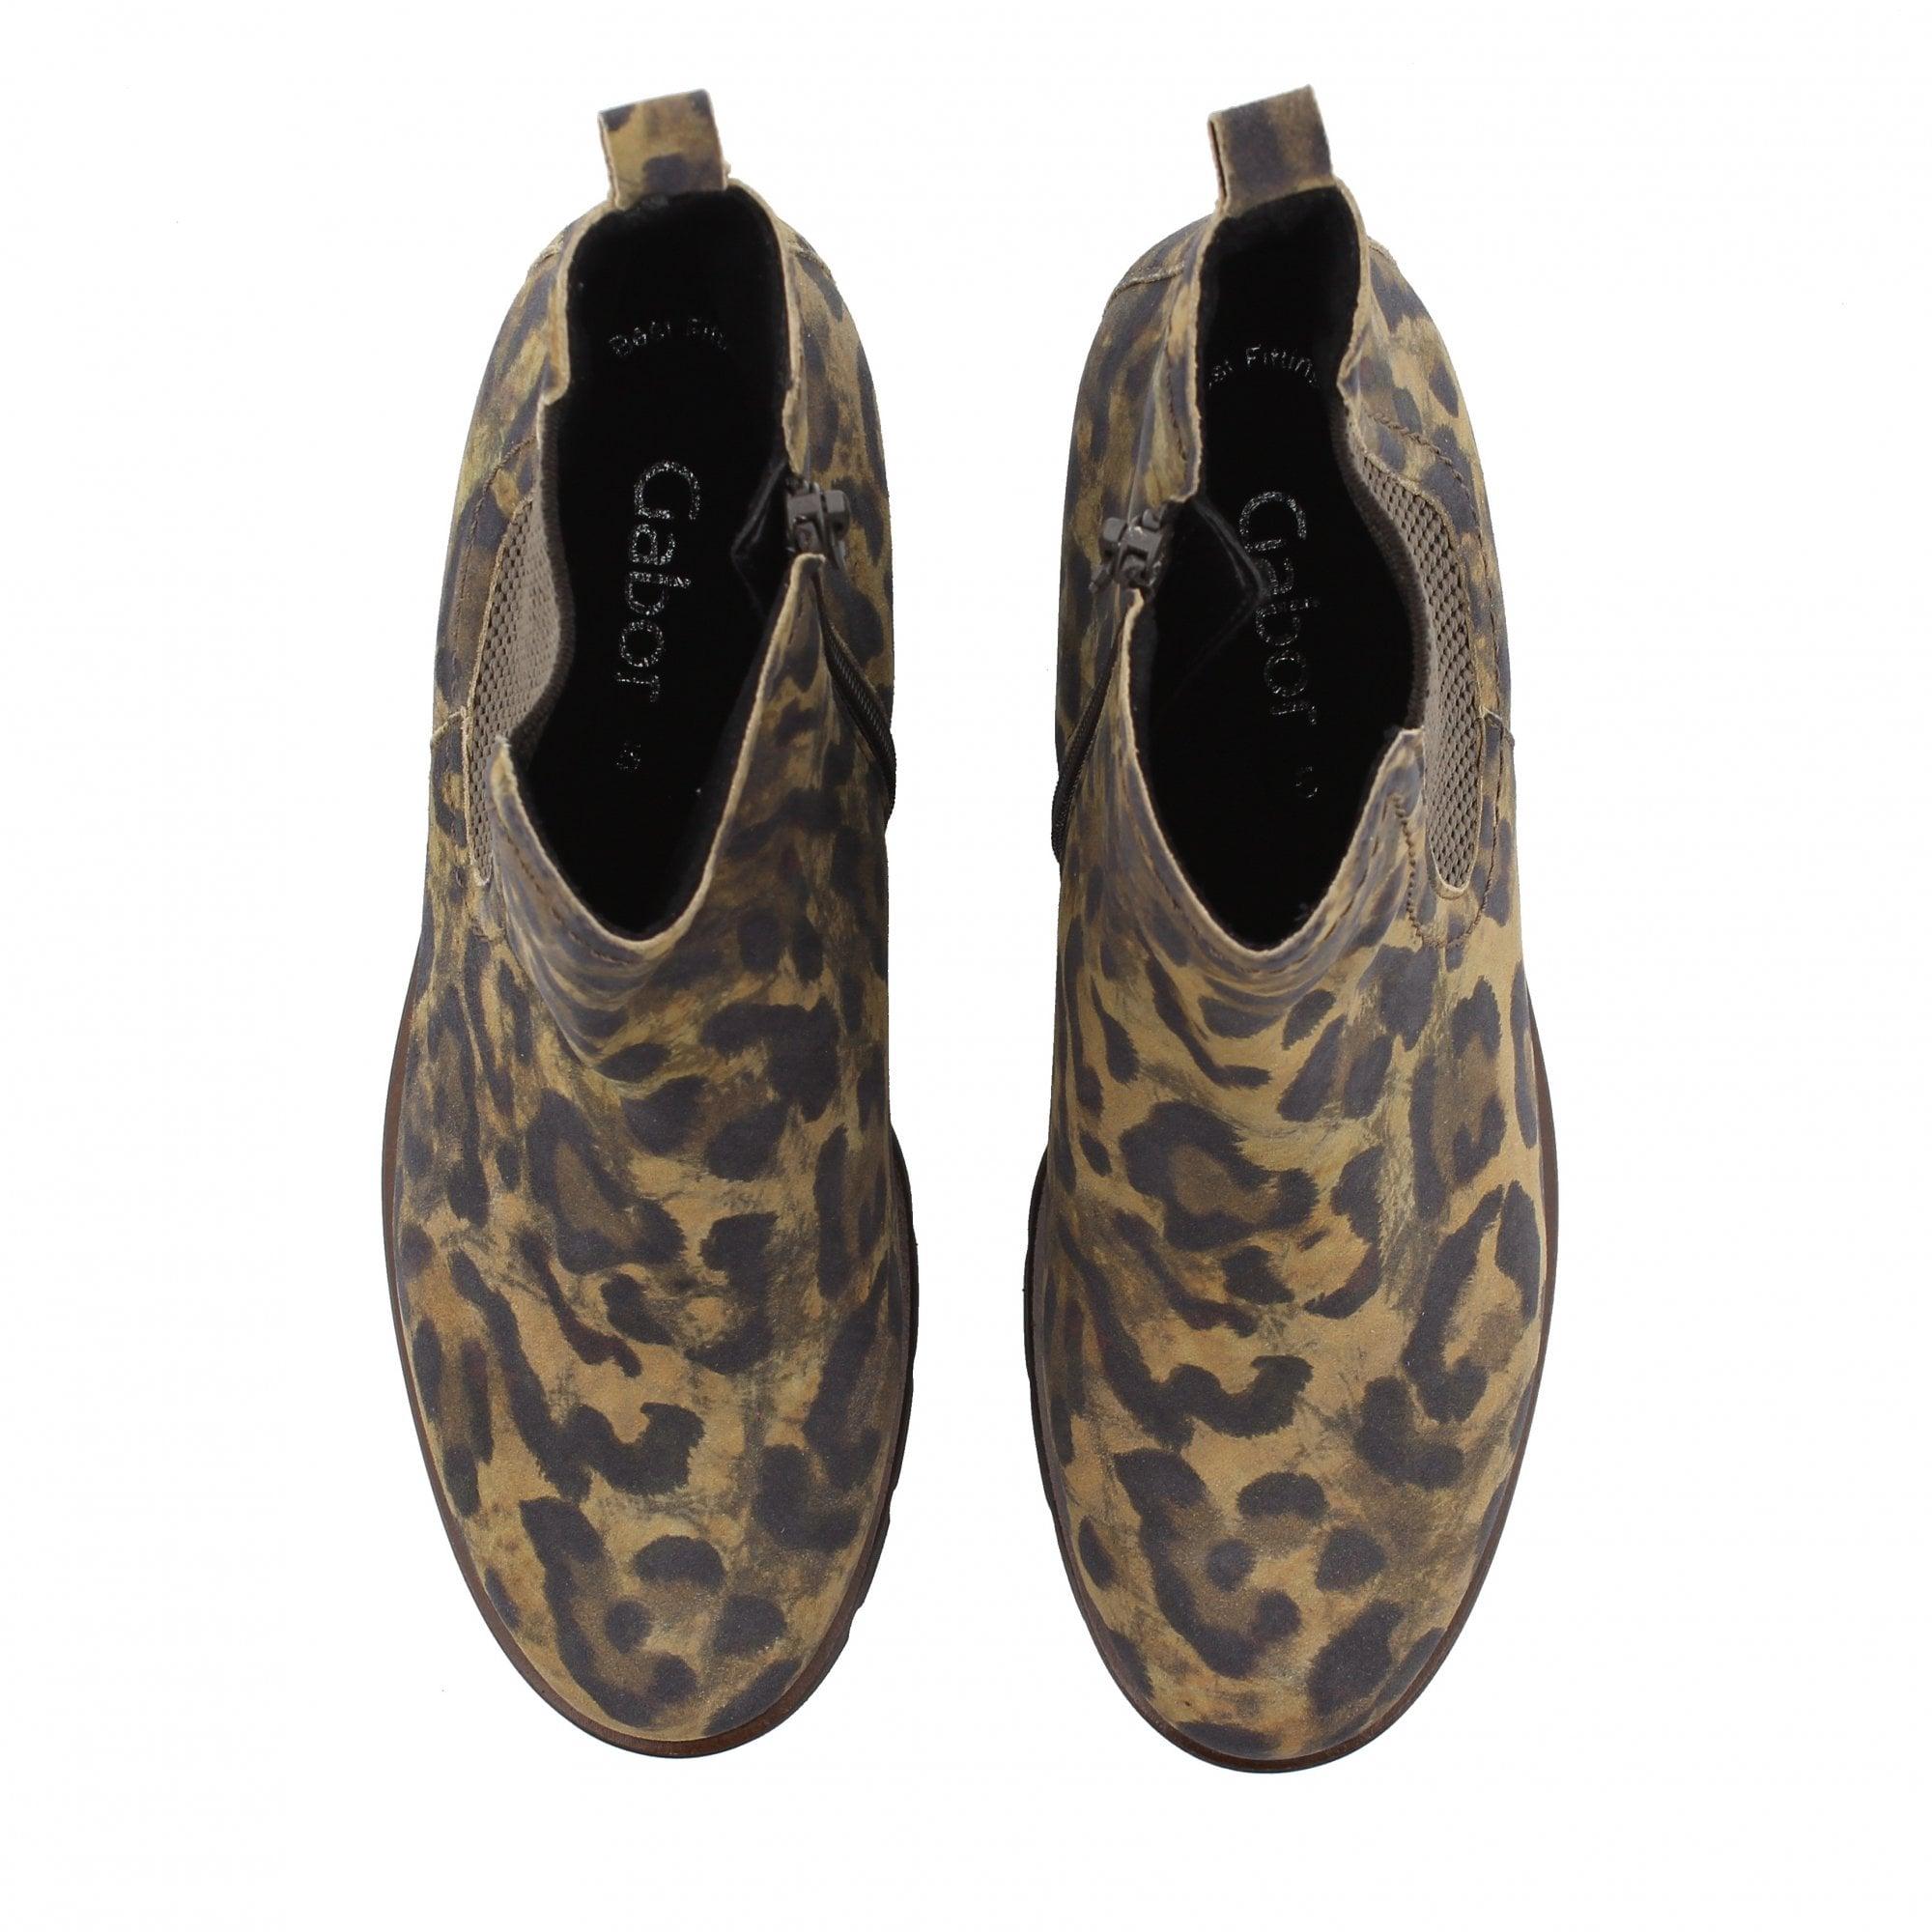 Gabor Bodo 34-710-48 Leopard Print